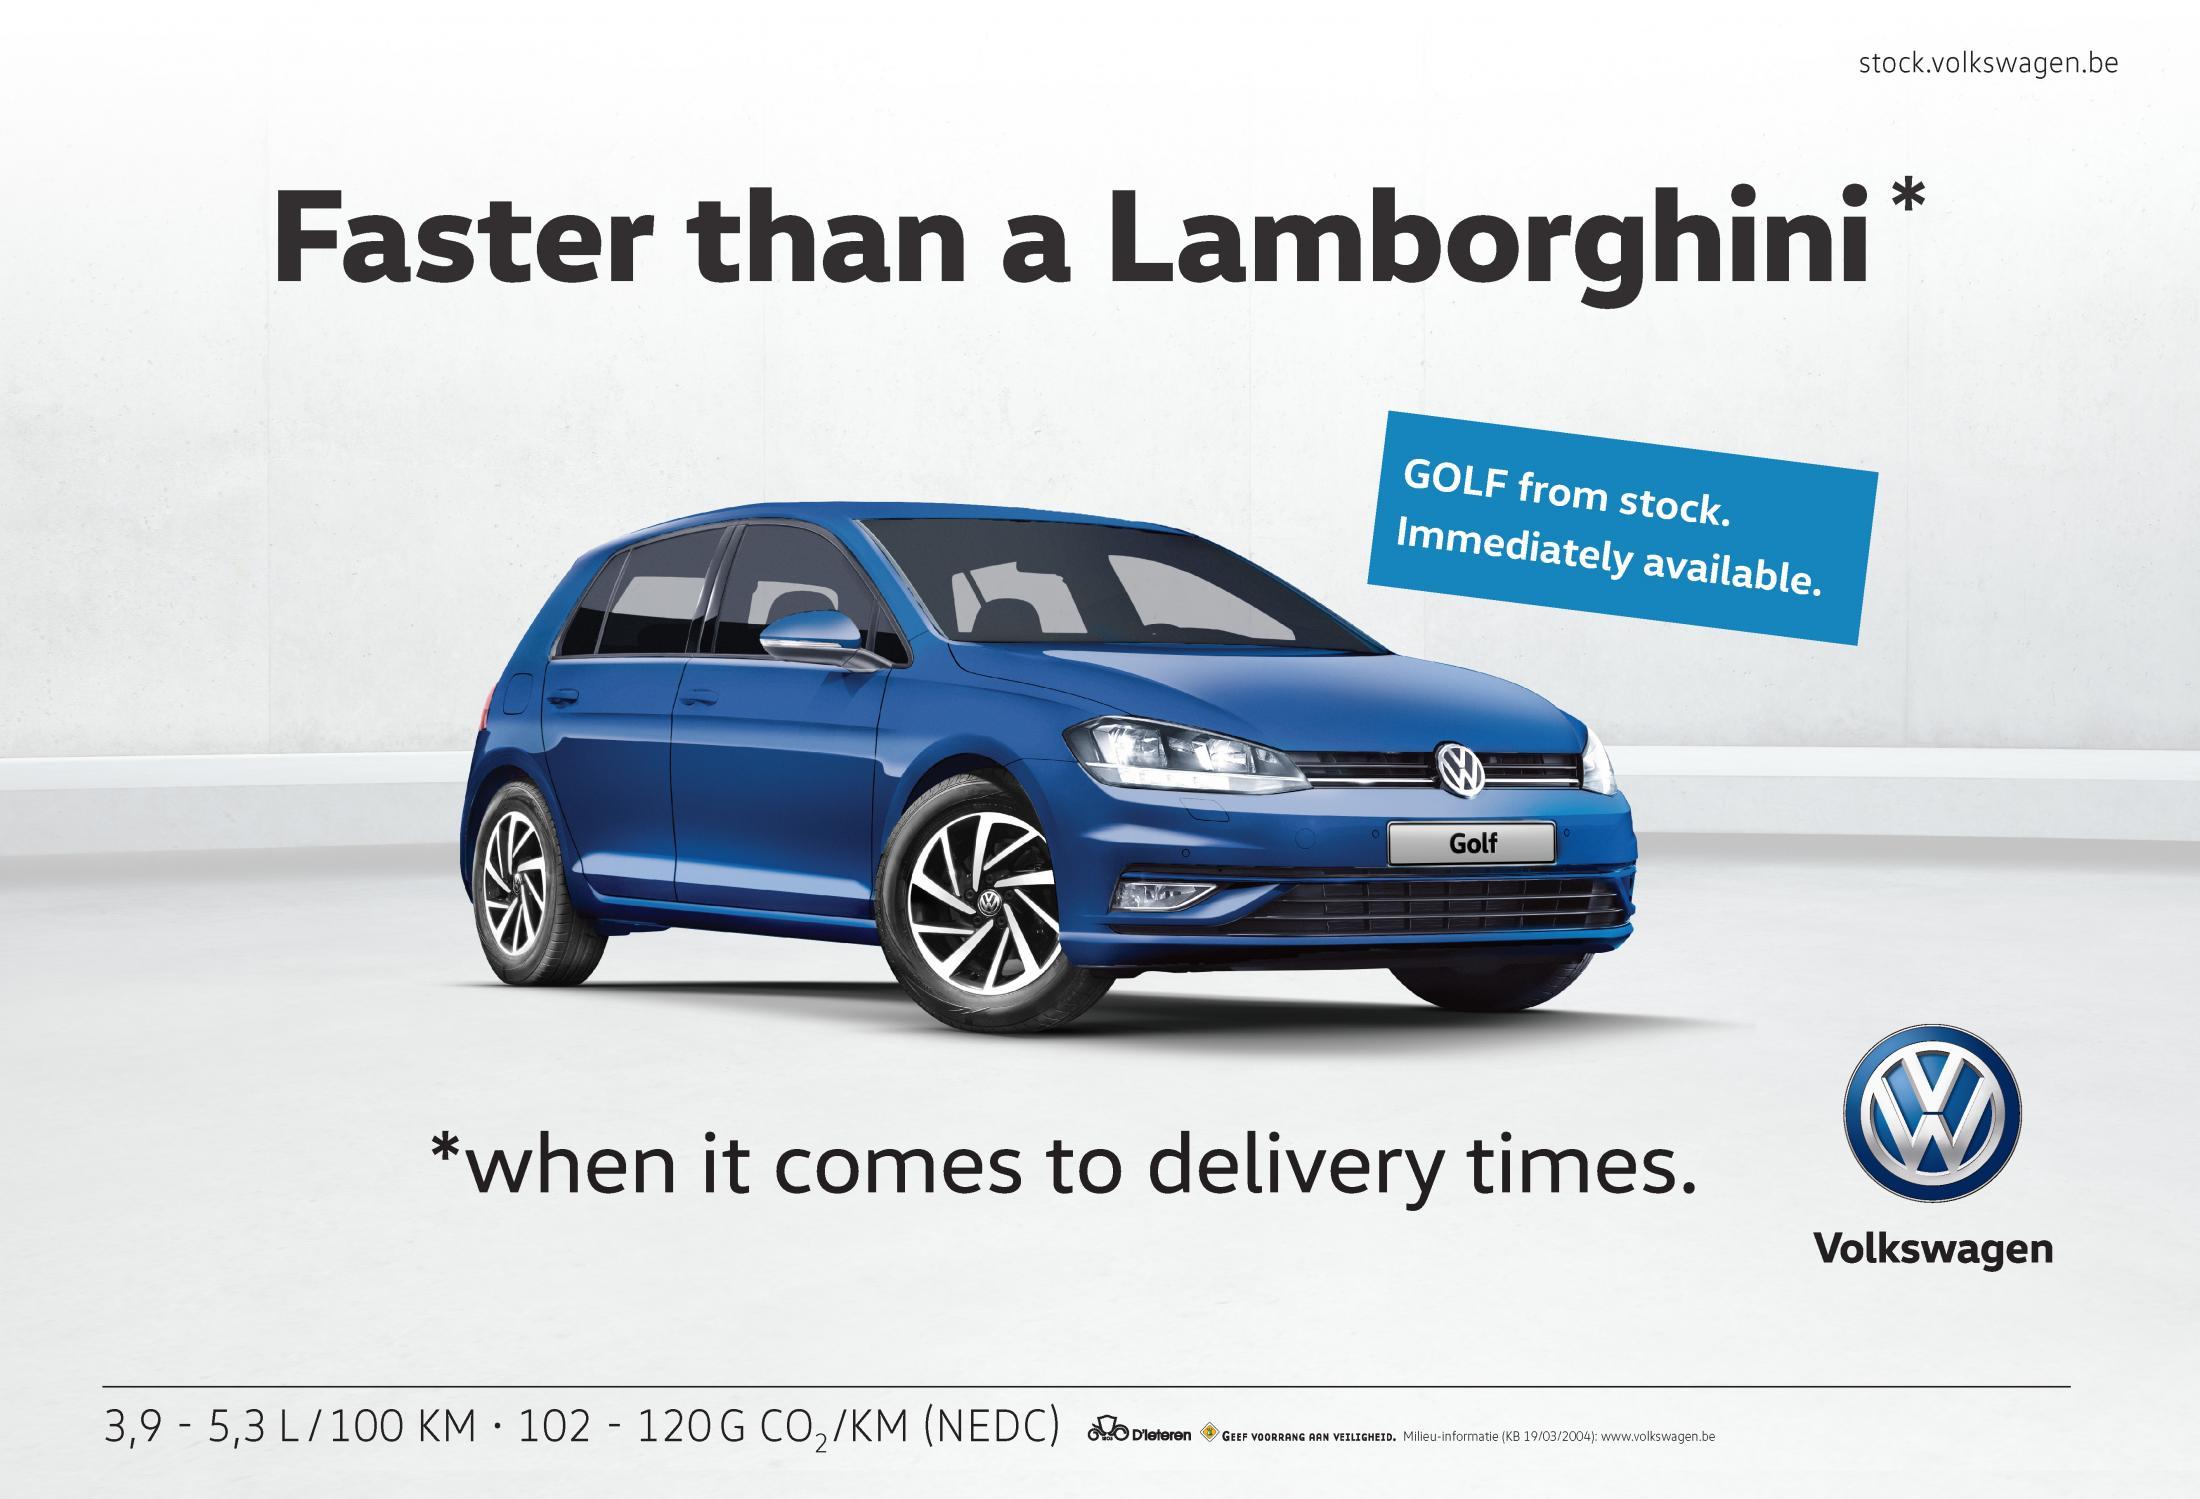 Volkswagen Integrated Ad - Faster Than a Lamborghini